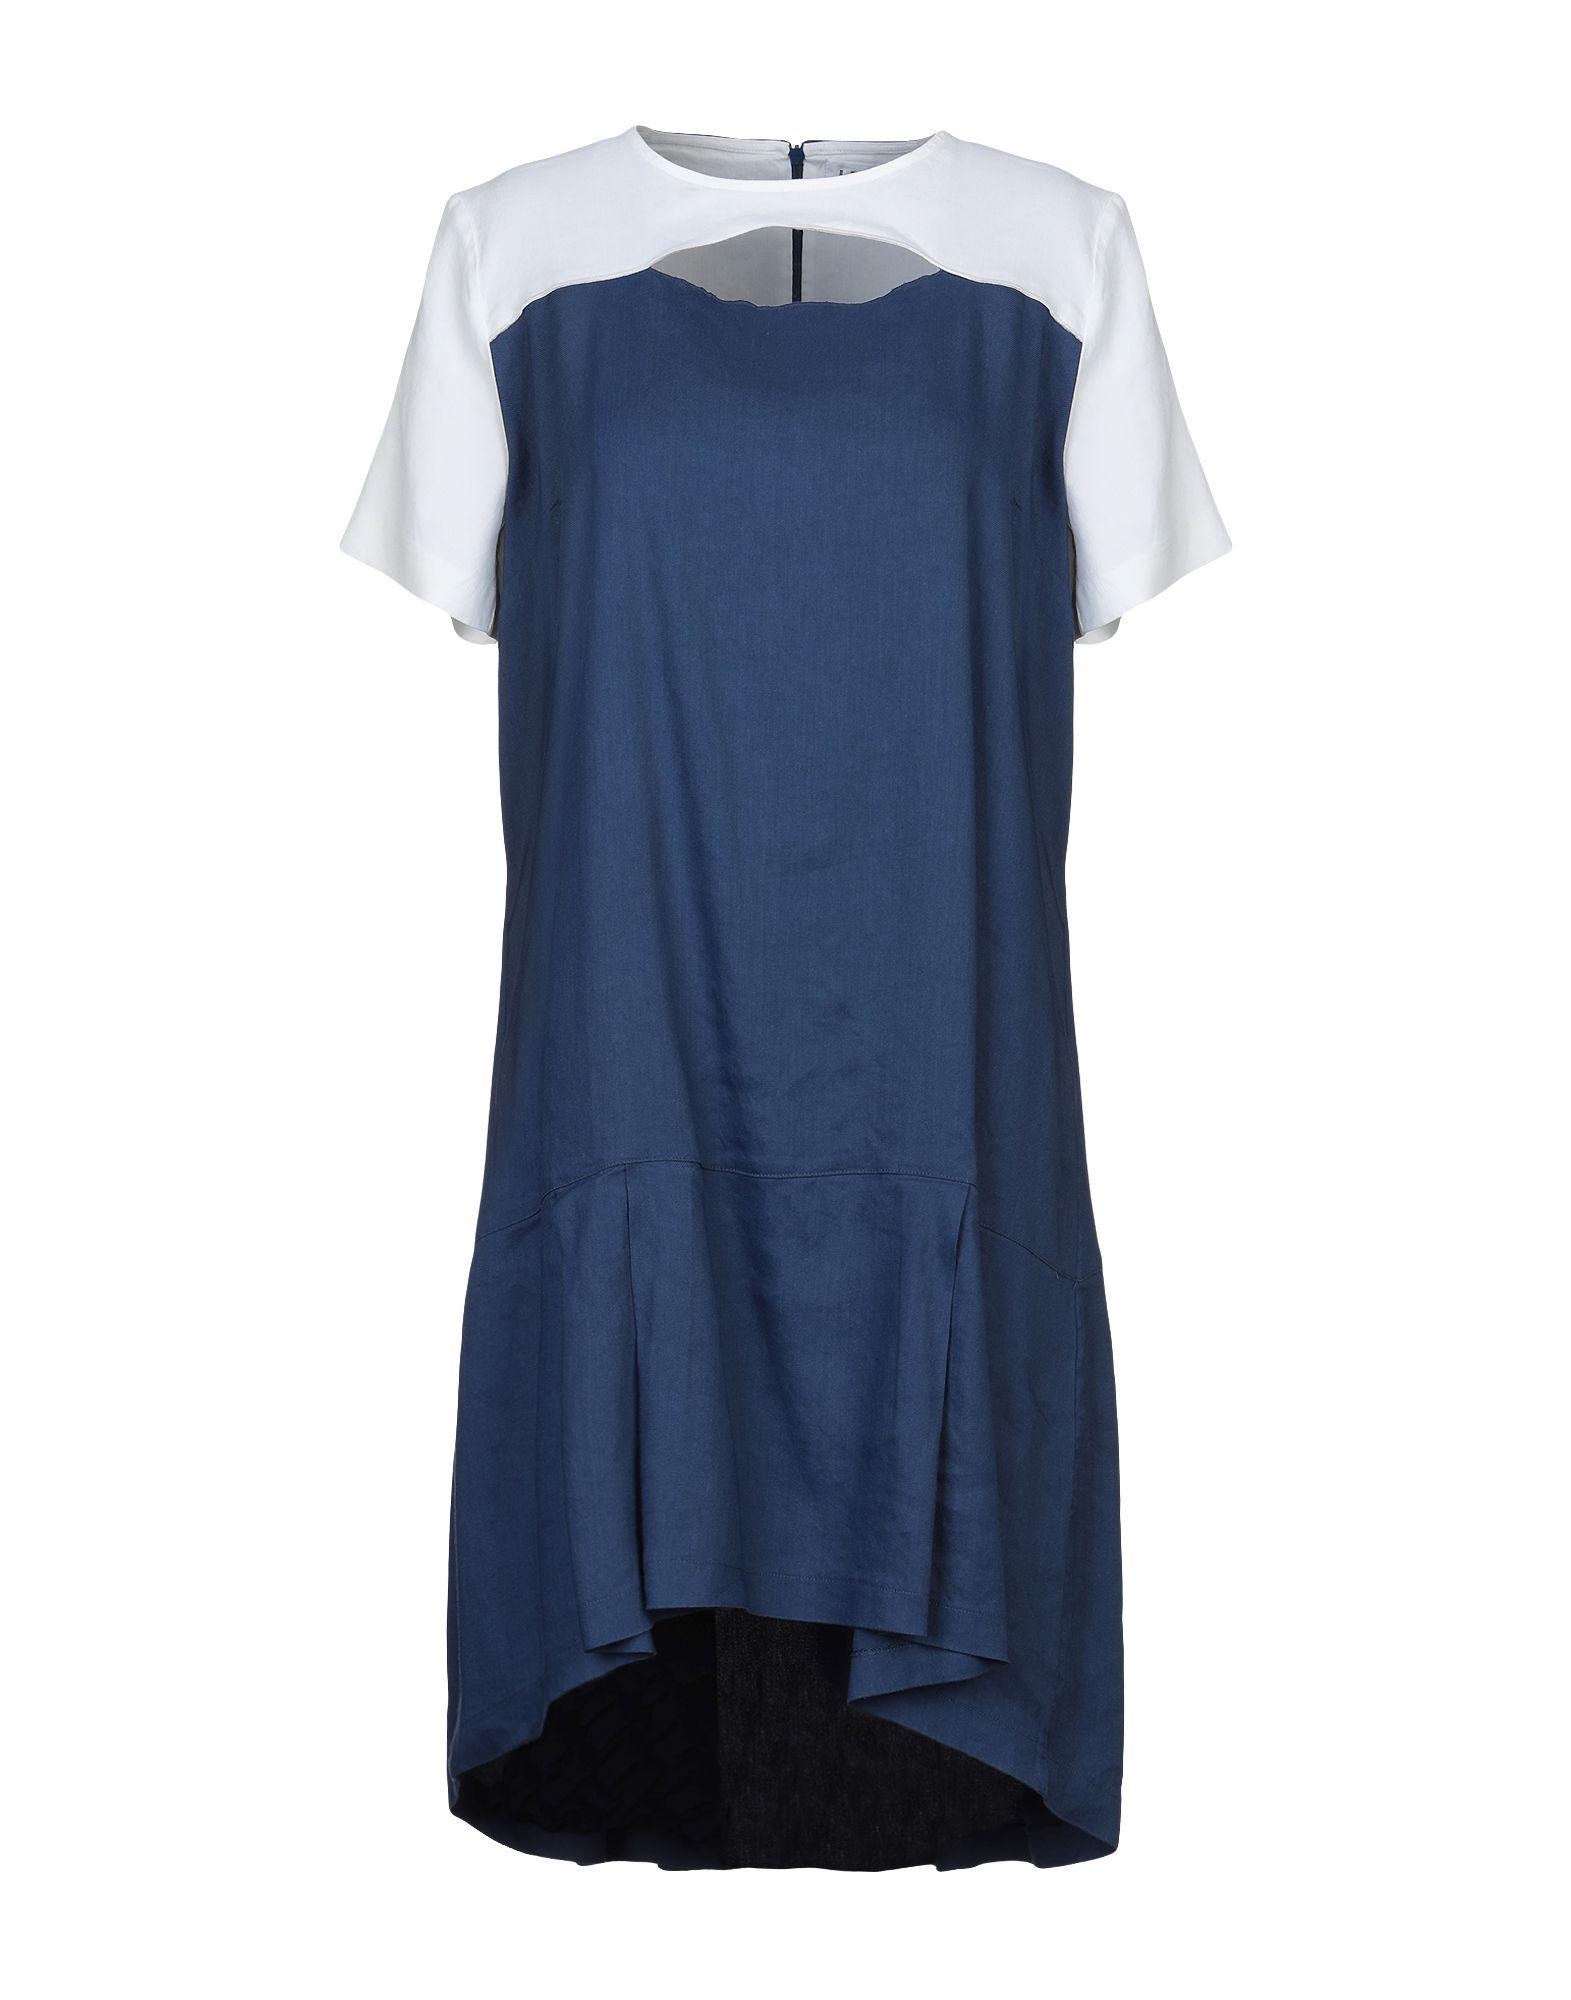 LFDL LA FABBRICA DEL LINO Короткое платье